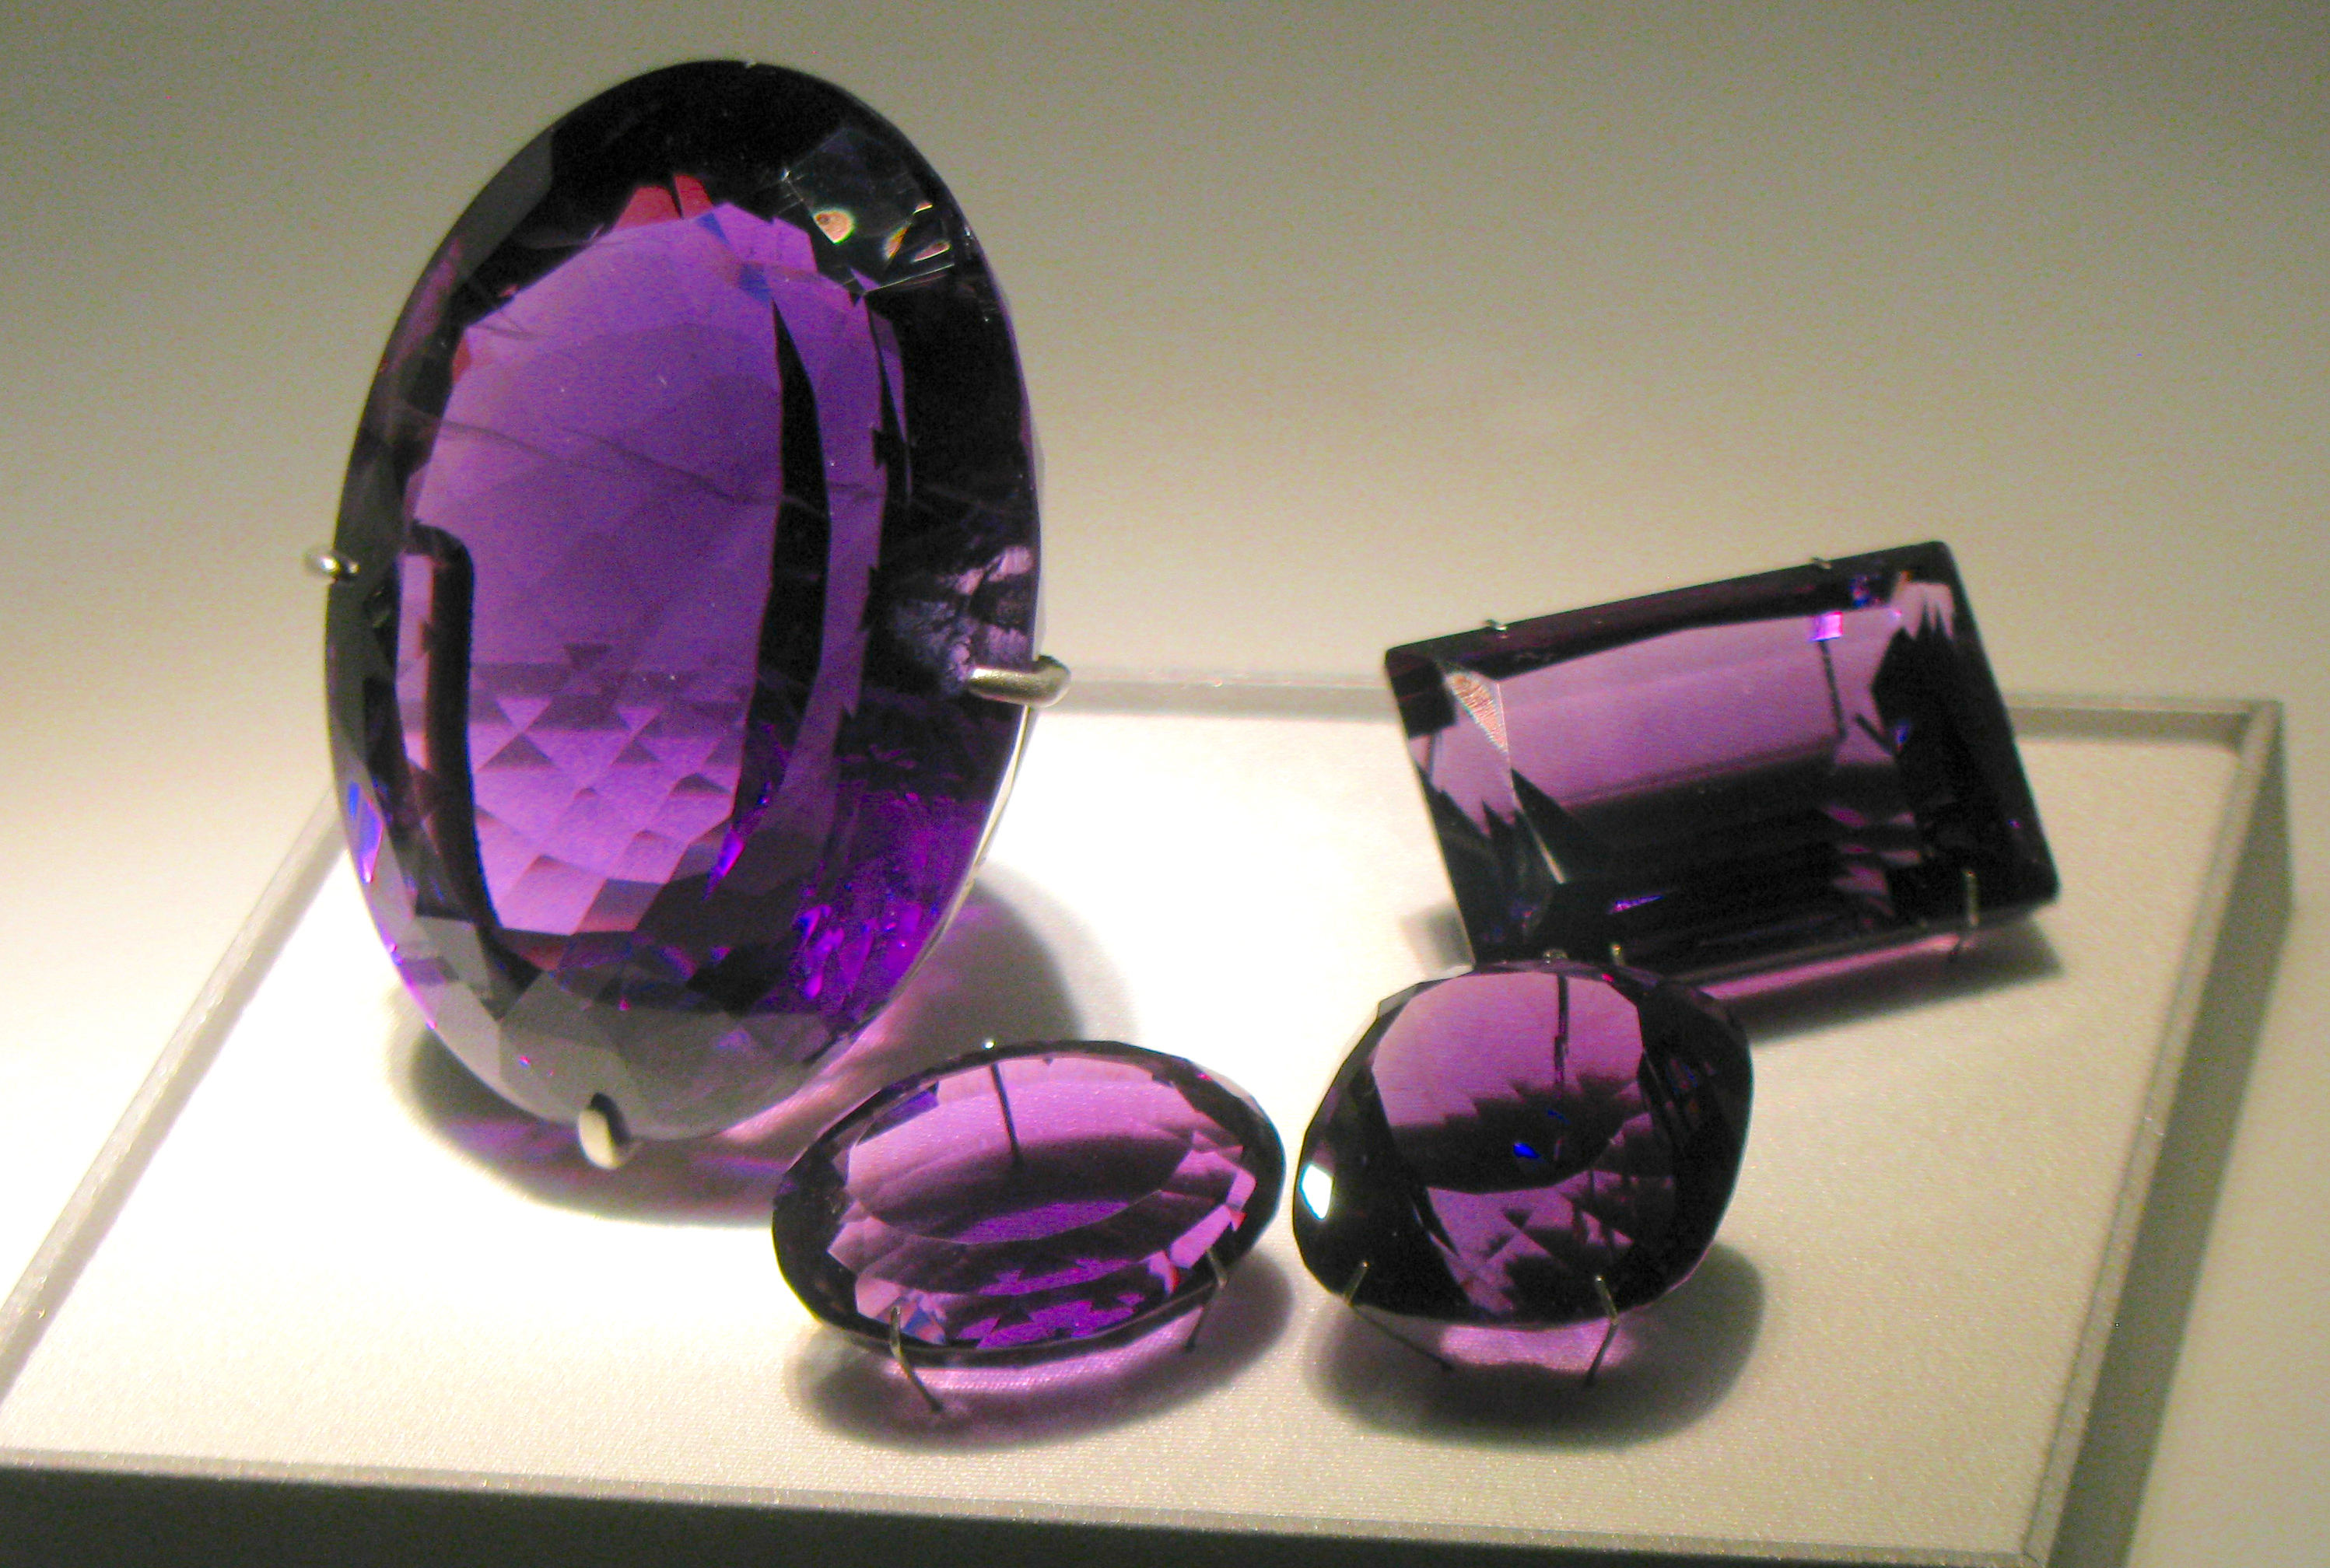 Oavl Pear Shape Jewelry Making Loose Gemstones Normal Cut Amethyst Amethyst Wholesale Lot Natural Purple Amethyst Round